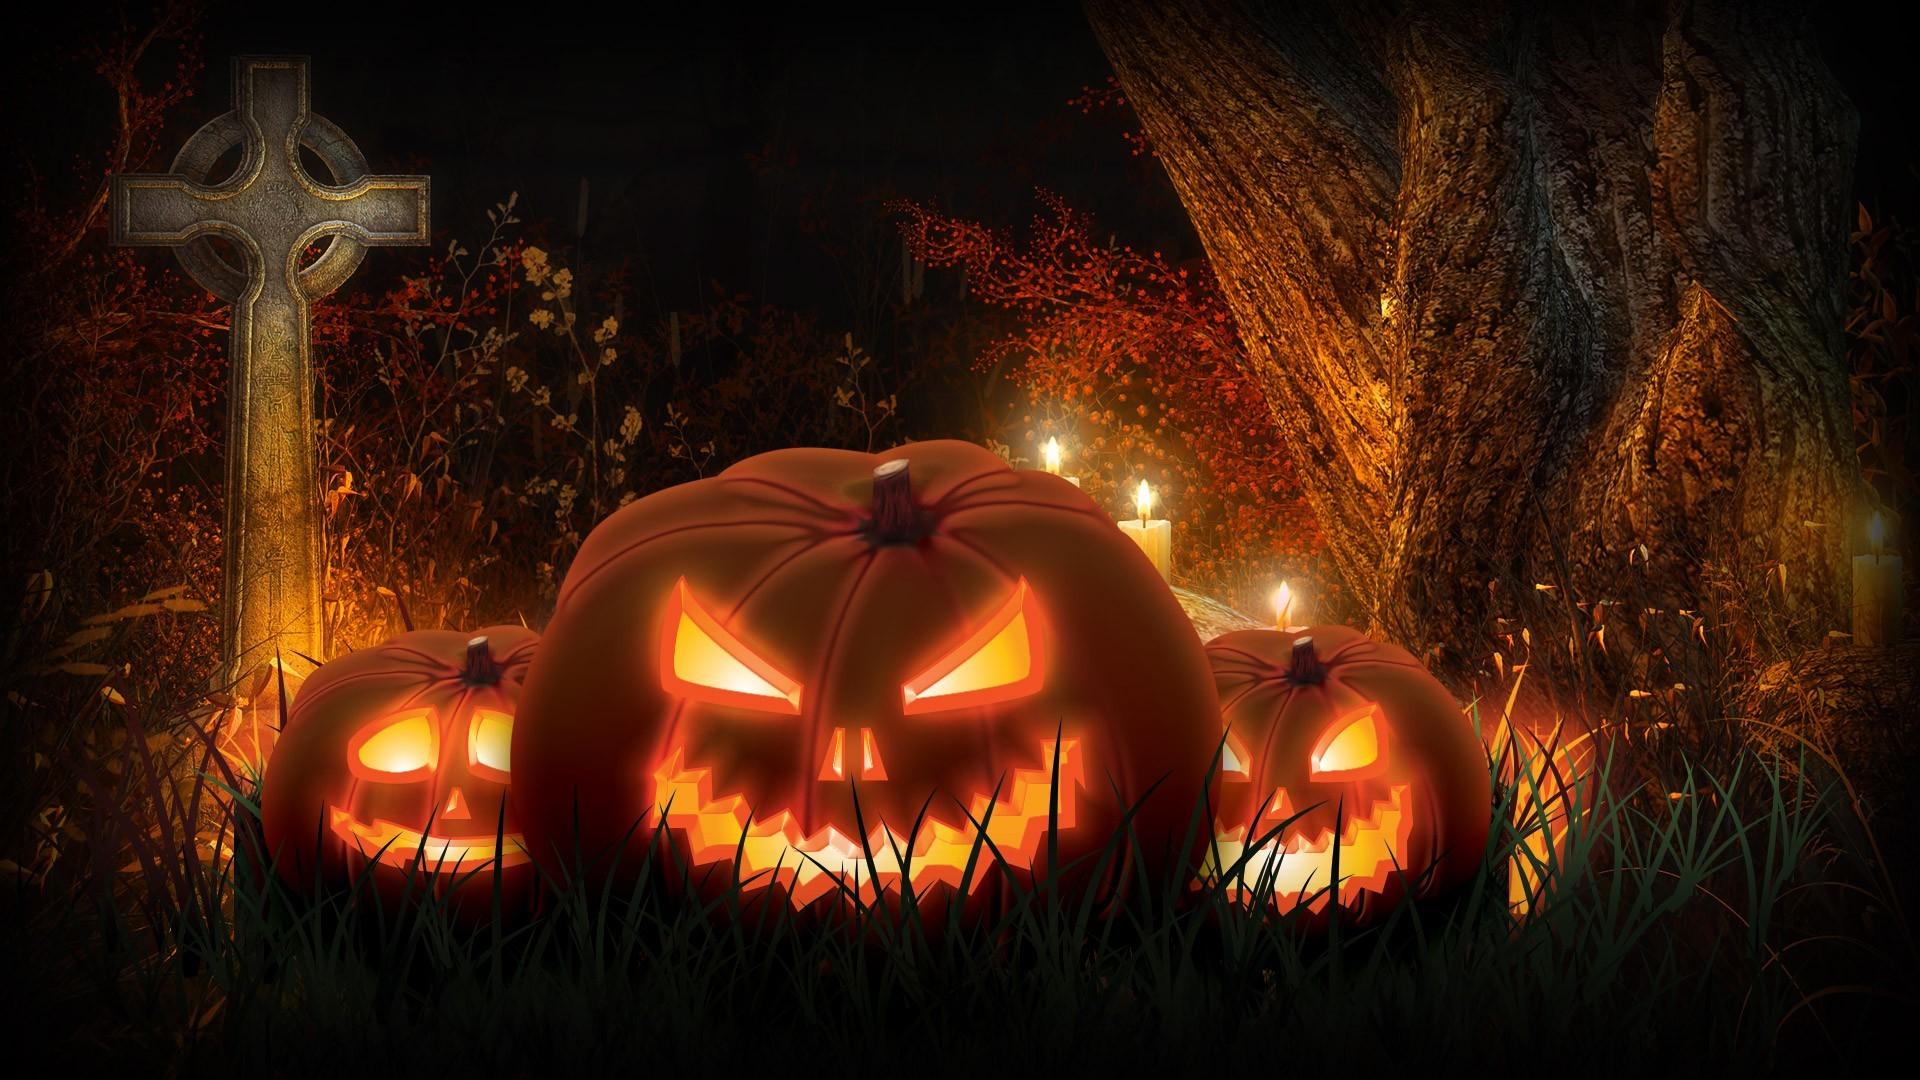 Scary Halloween Desktop Wallpaper ·① WallpaperTag